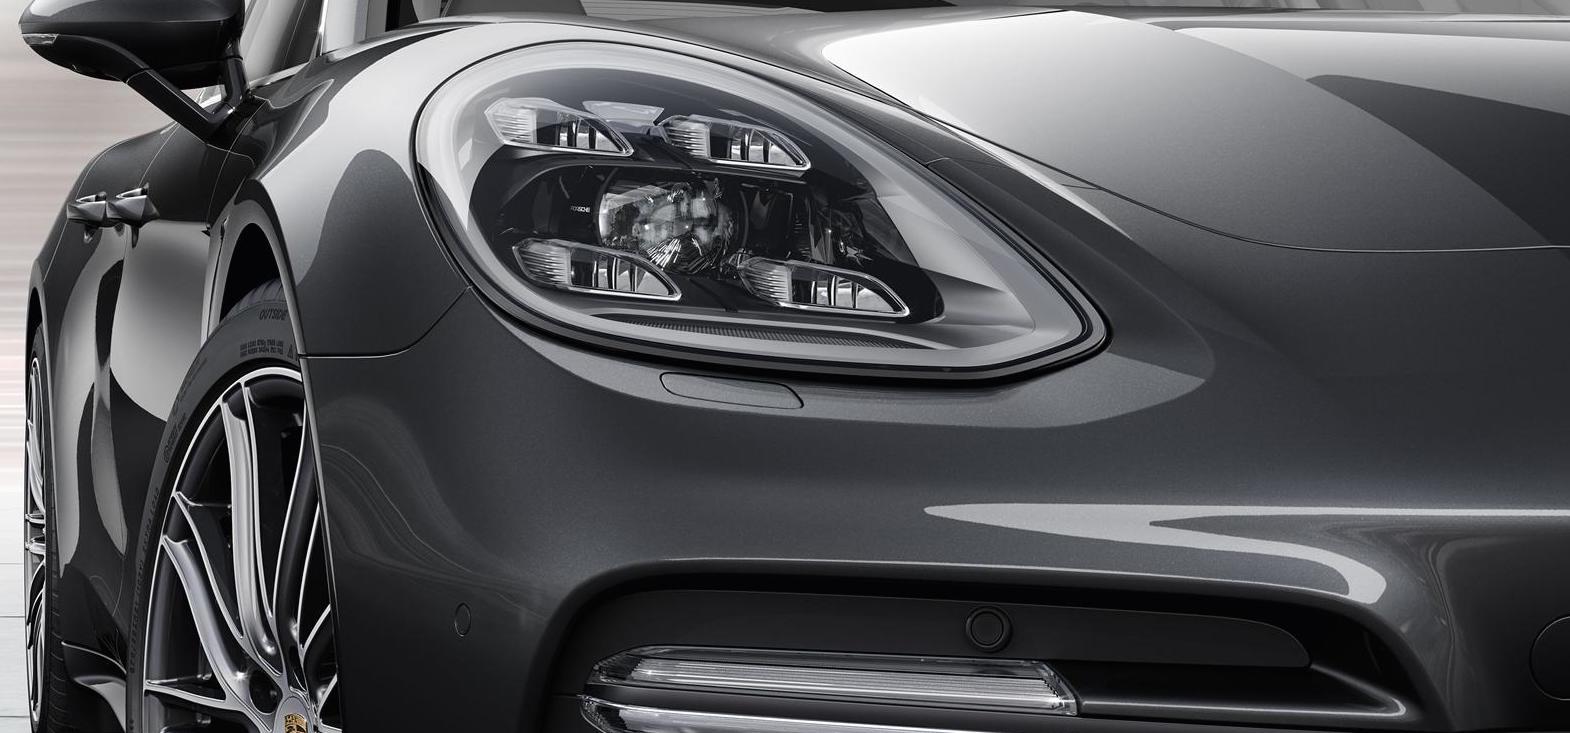 safety environment - Porsche Panamera Black And White